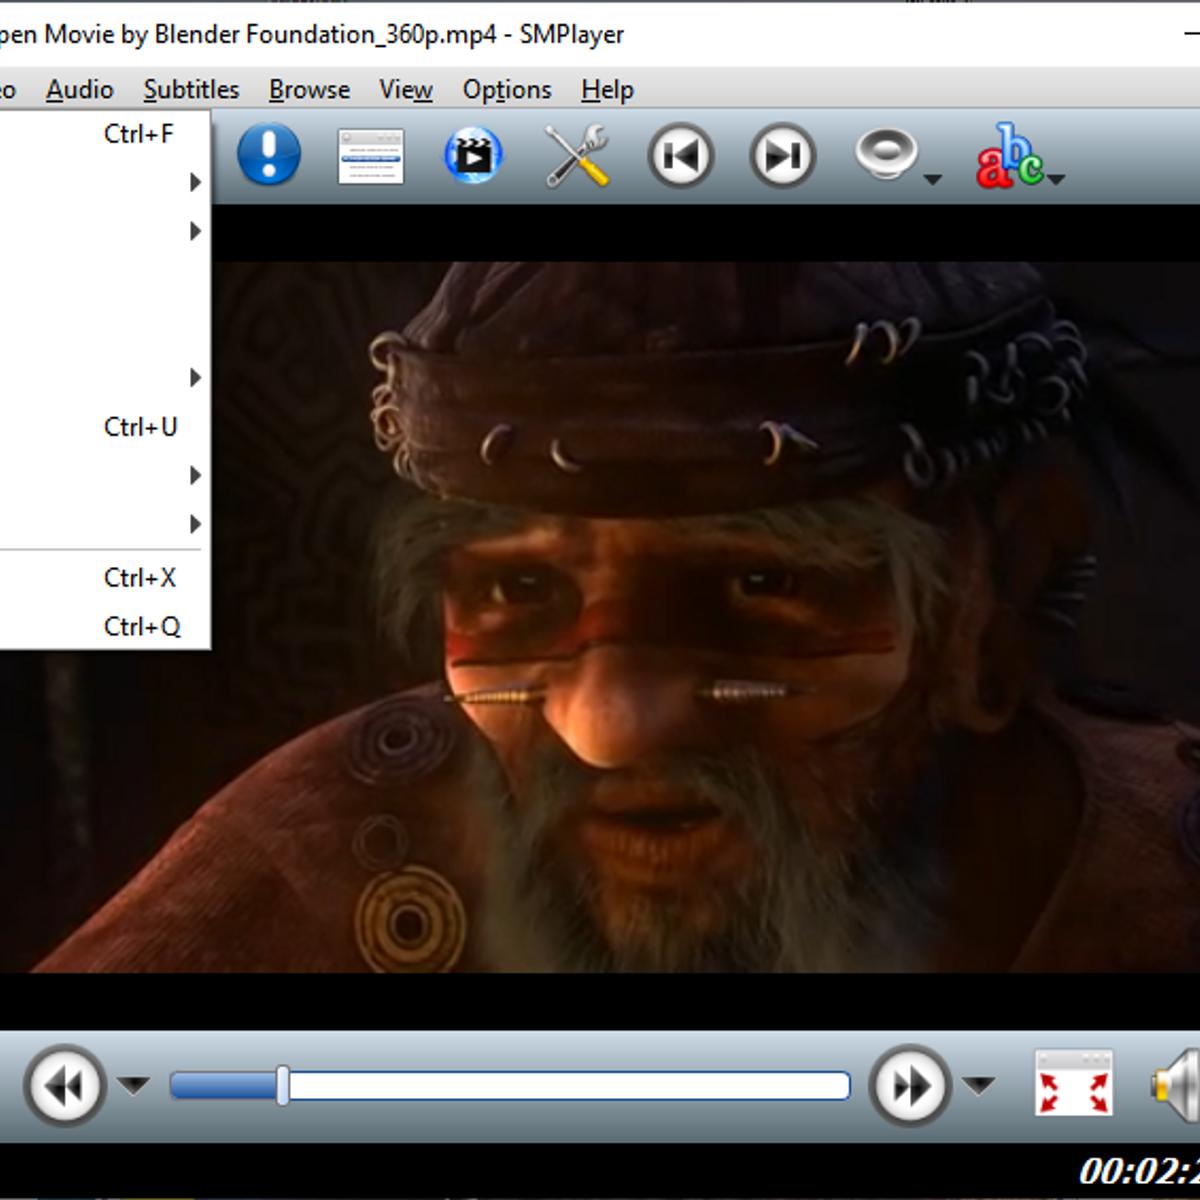 SMPlayer Alternatives and Similar Software - AlternativeTo net